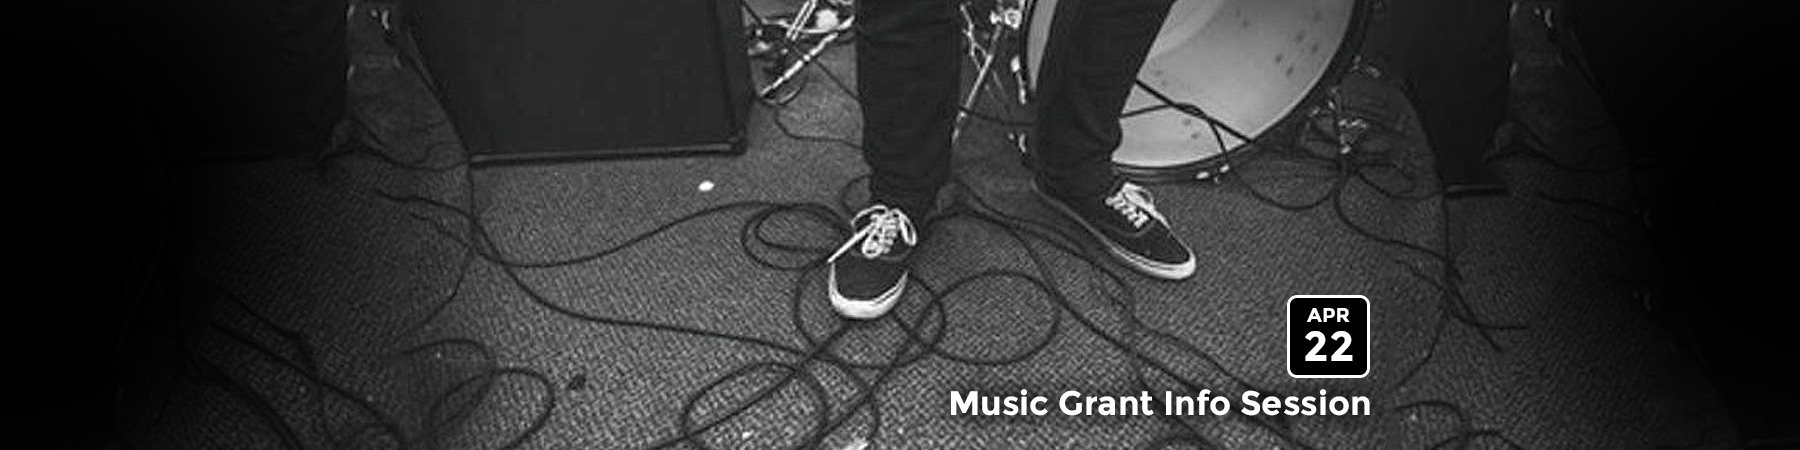 next music grant info session